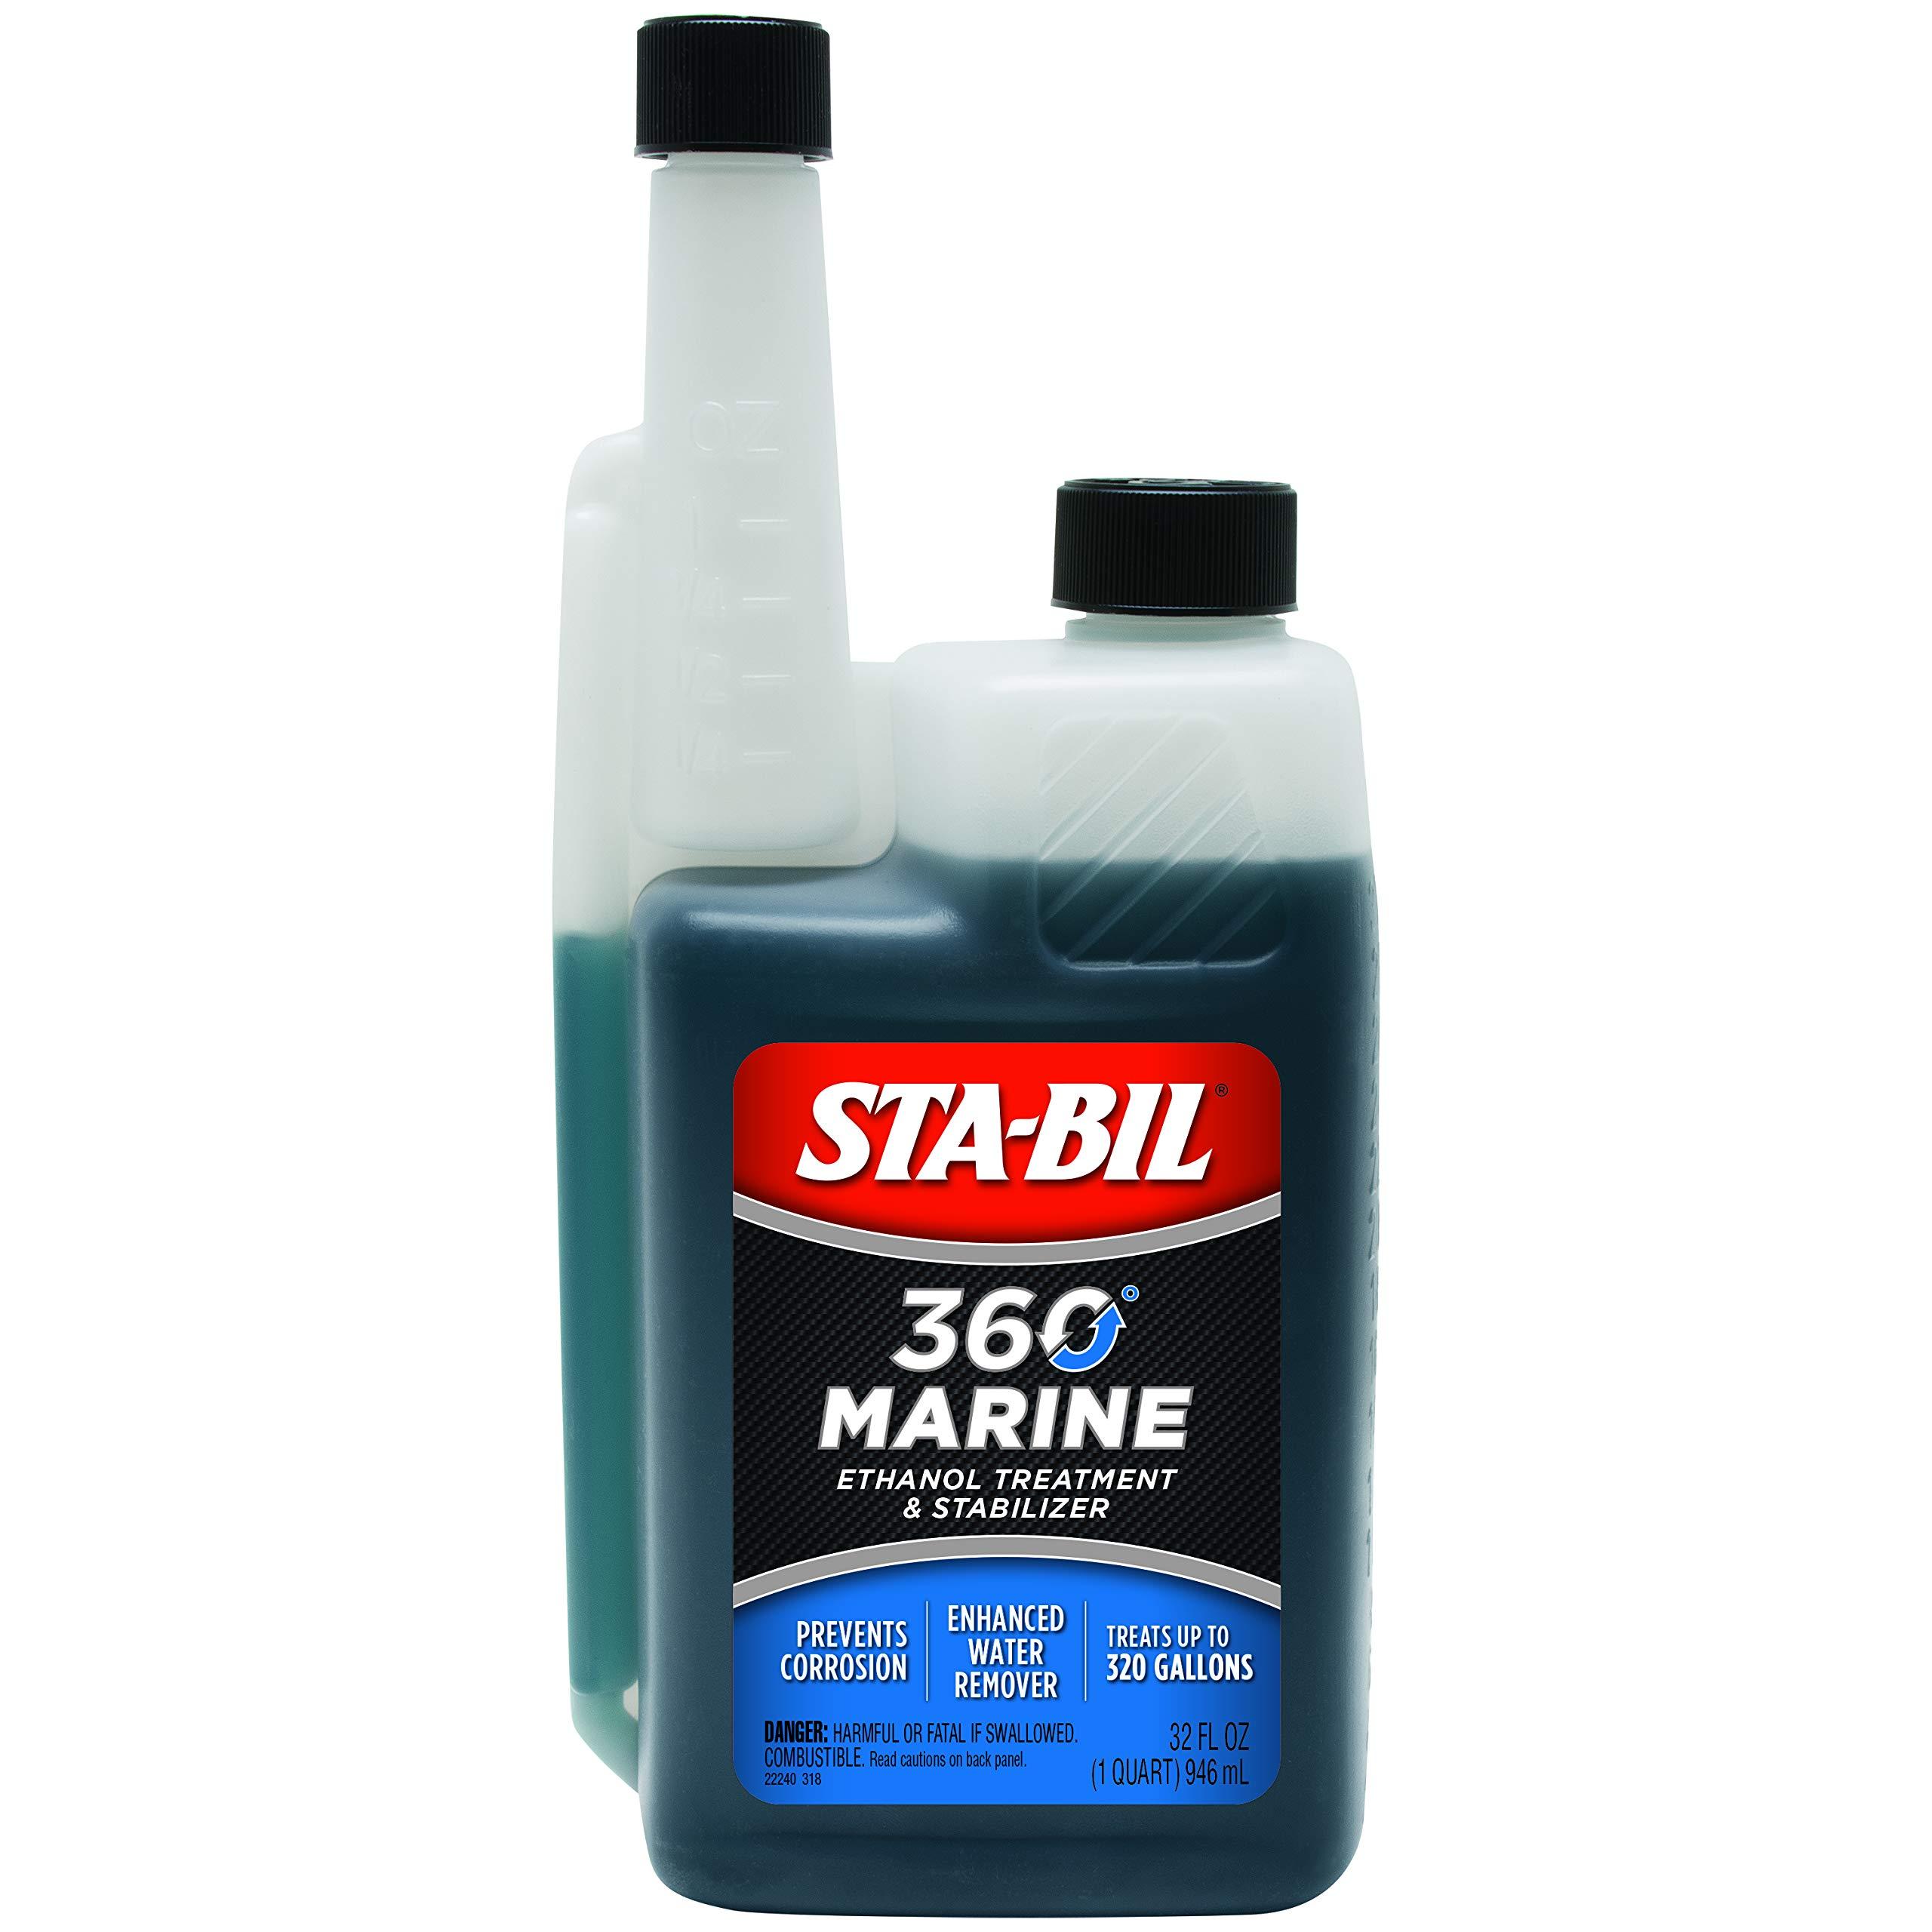 STA-BIL 360 22240-6PK Marine with Vapor Technology, 32 oz. (Pack of 6)